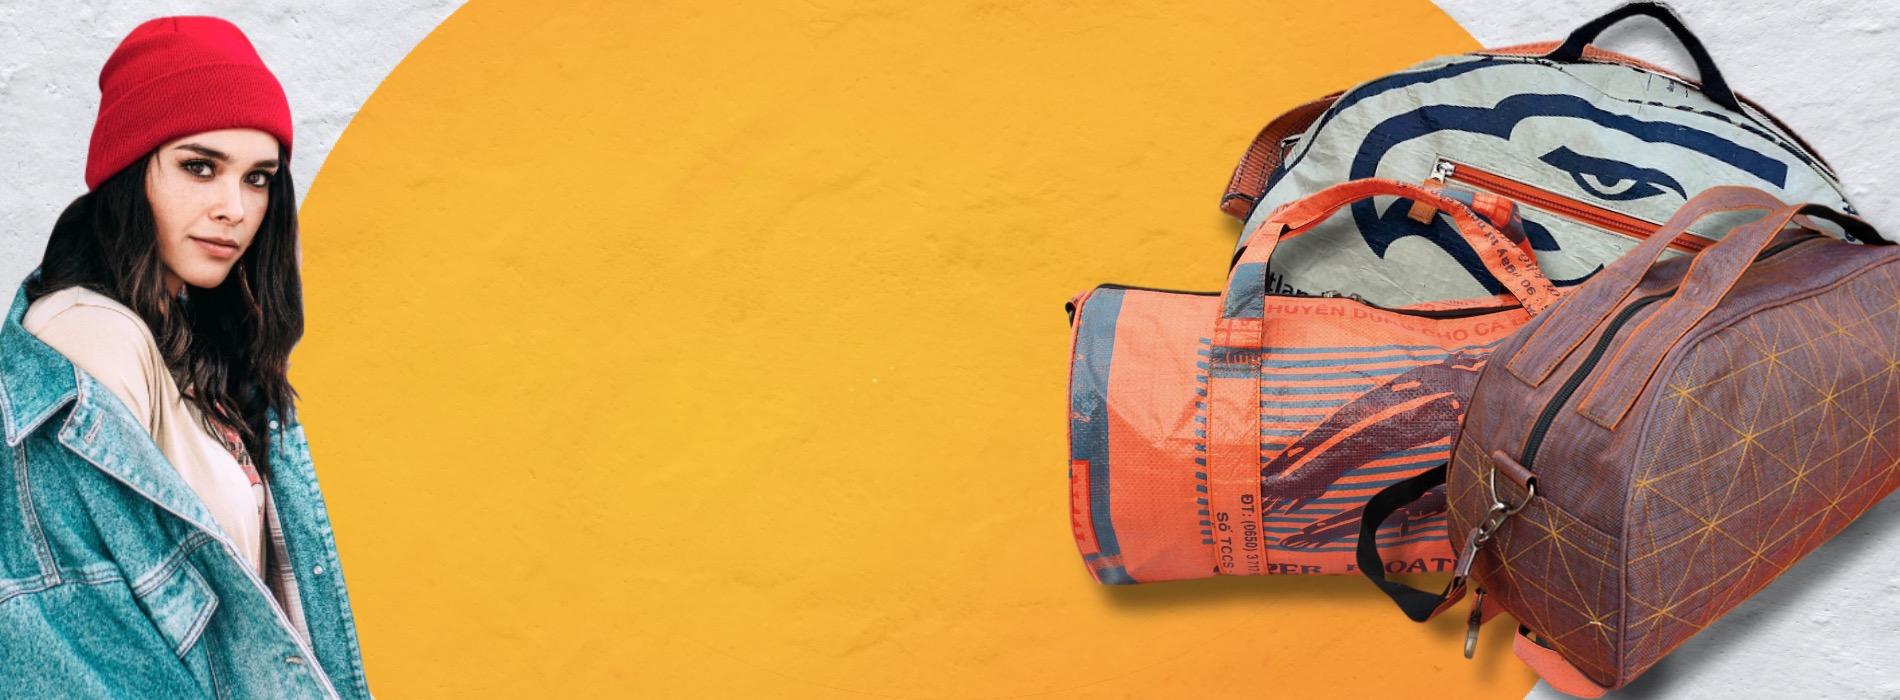 Beadbags Reisetaschen Kategorie Block Beadbags